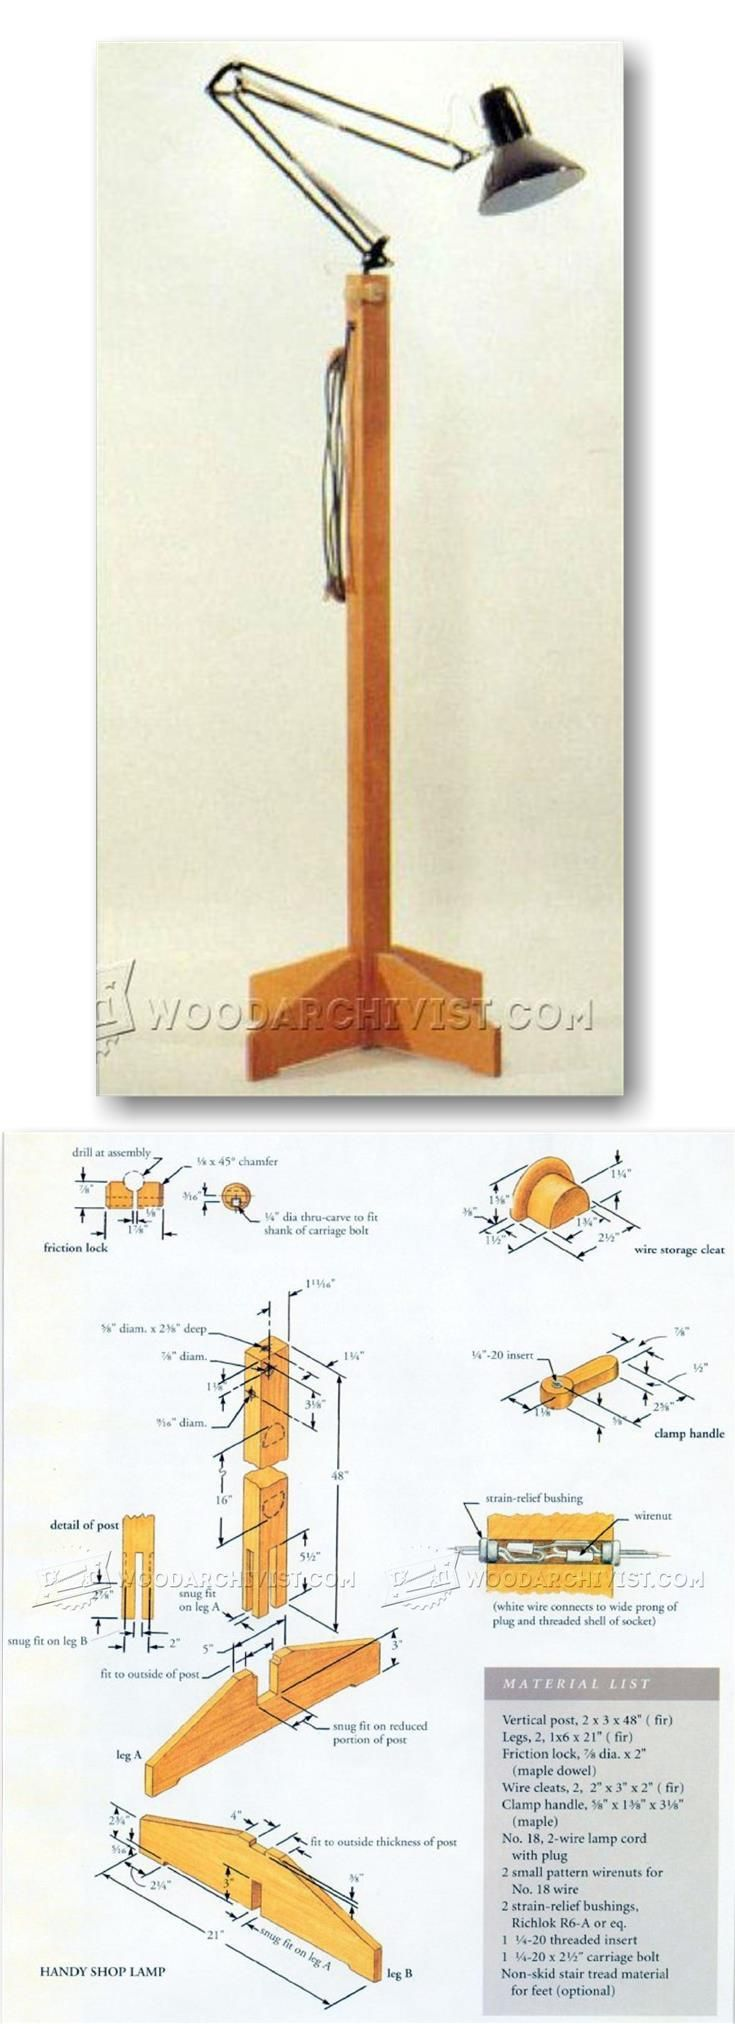 Handy Workshop Lamp - Workshop Solutions Projects, Tips and Tricks | WoodArchivist.com